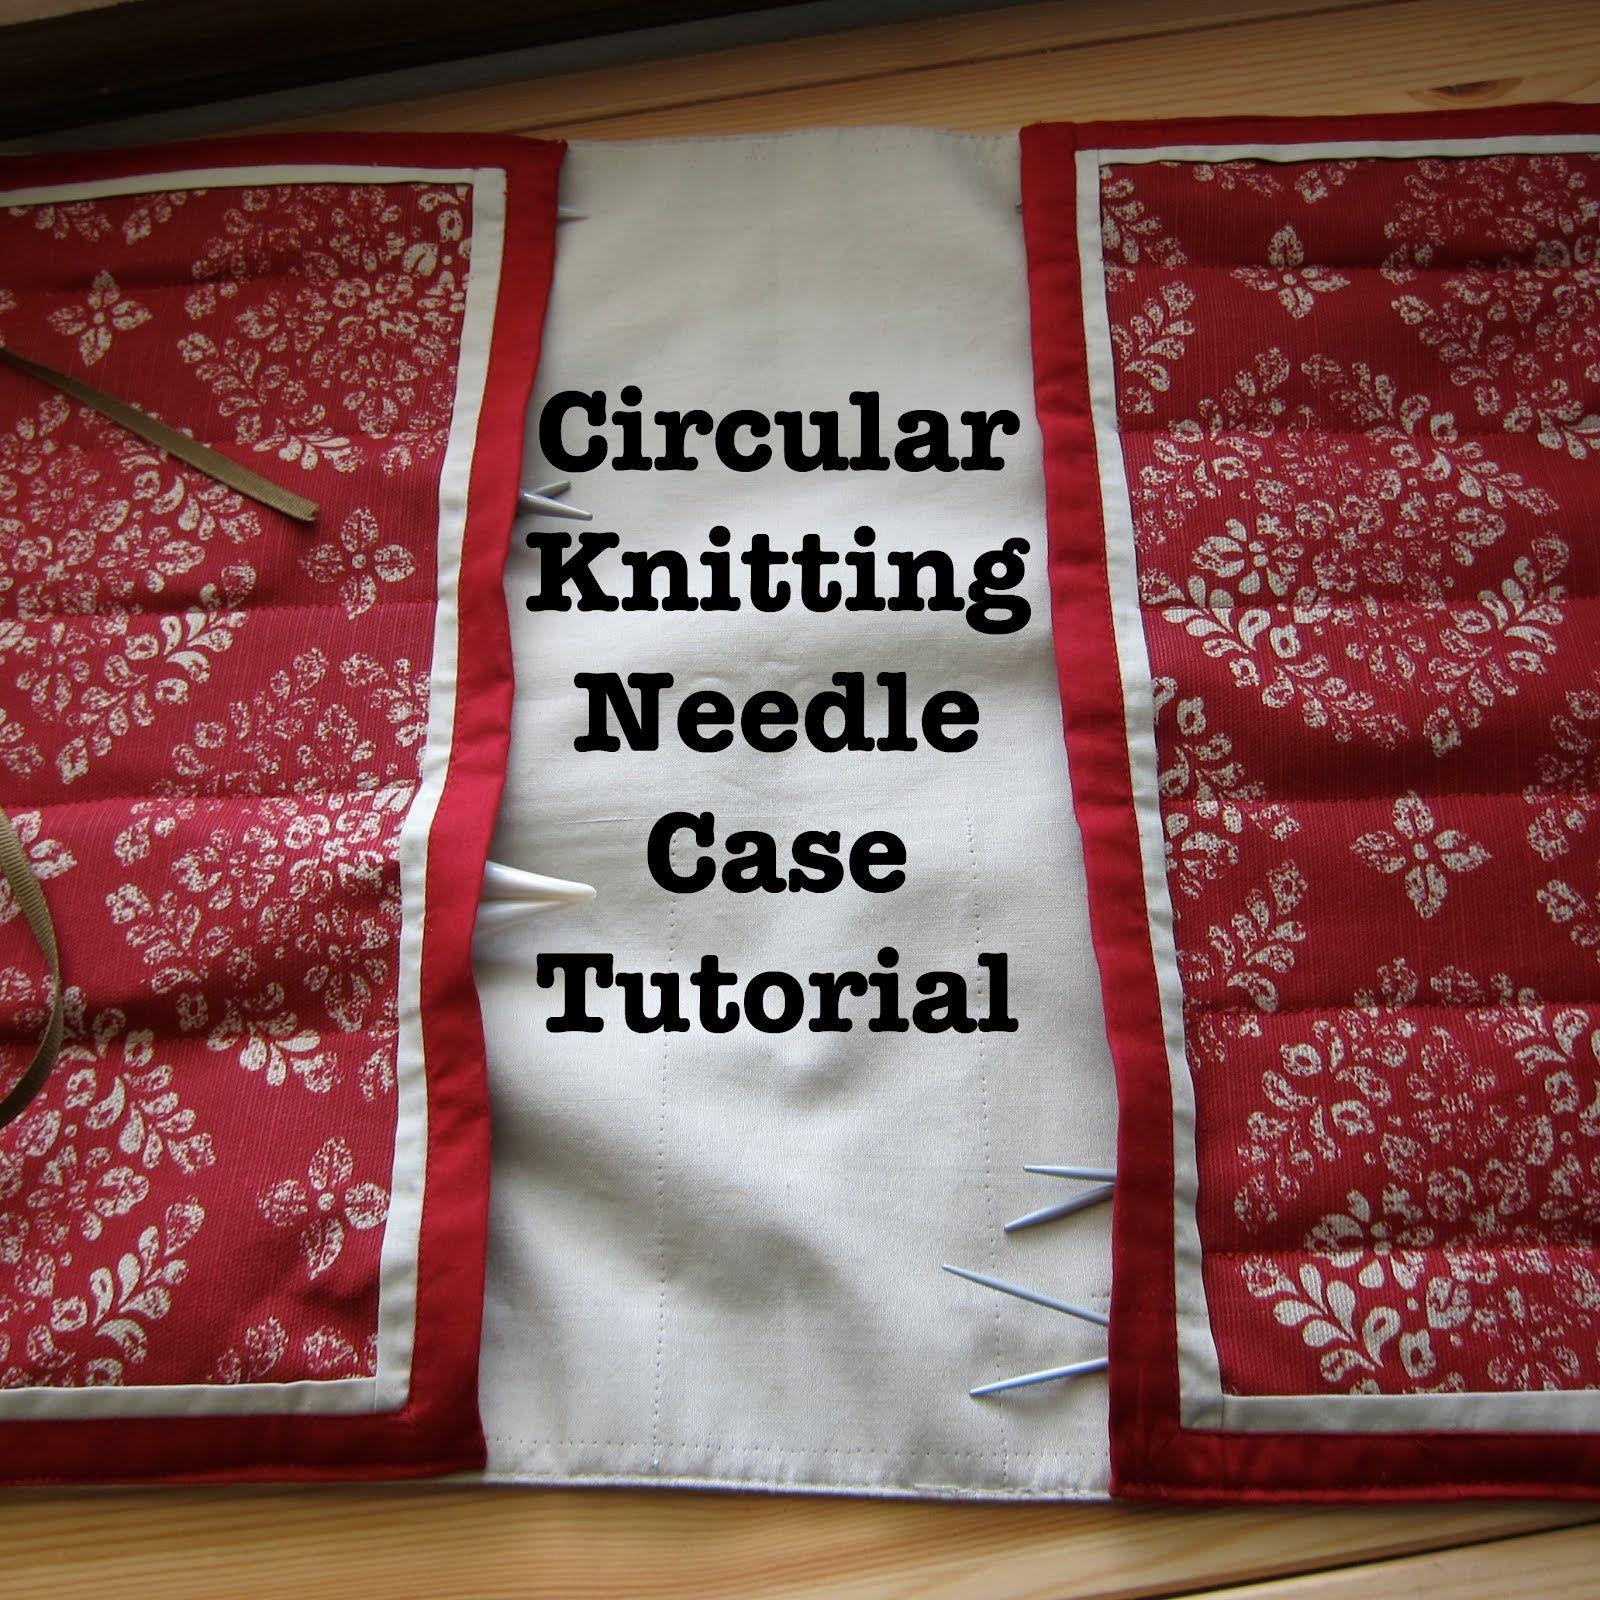 How To Store Knitting Needles : The gauge wars circular knitting needle case tutorial